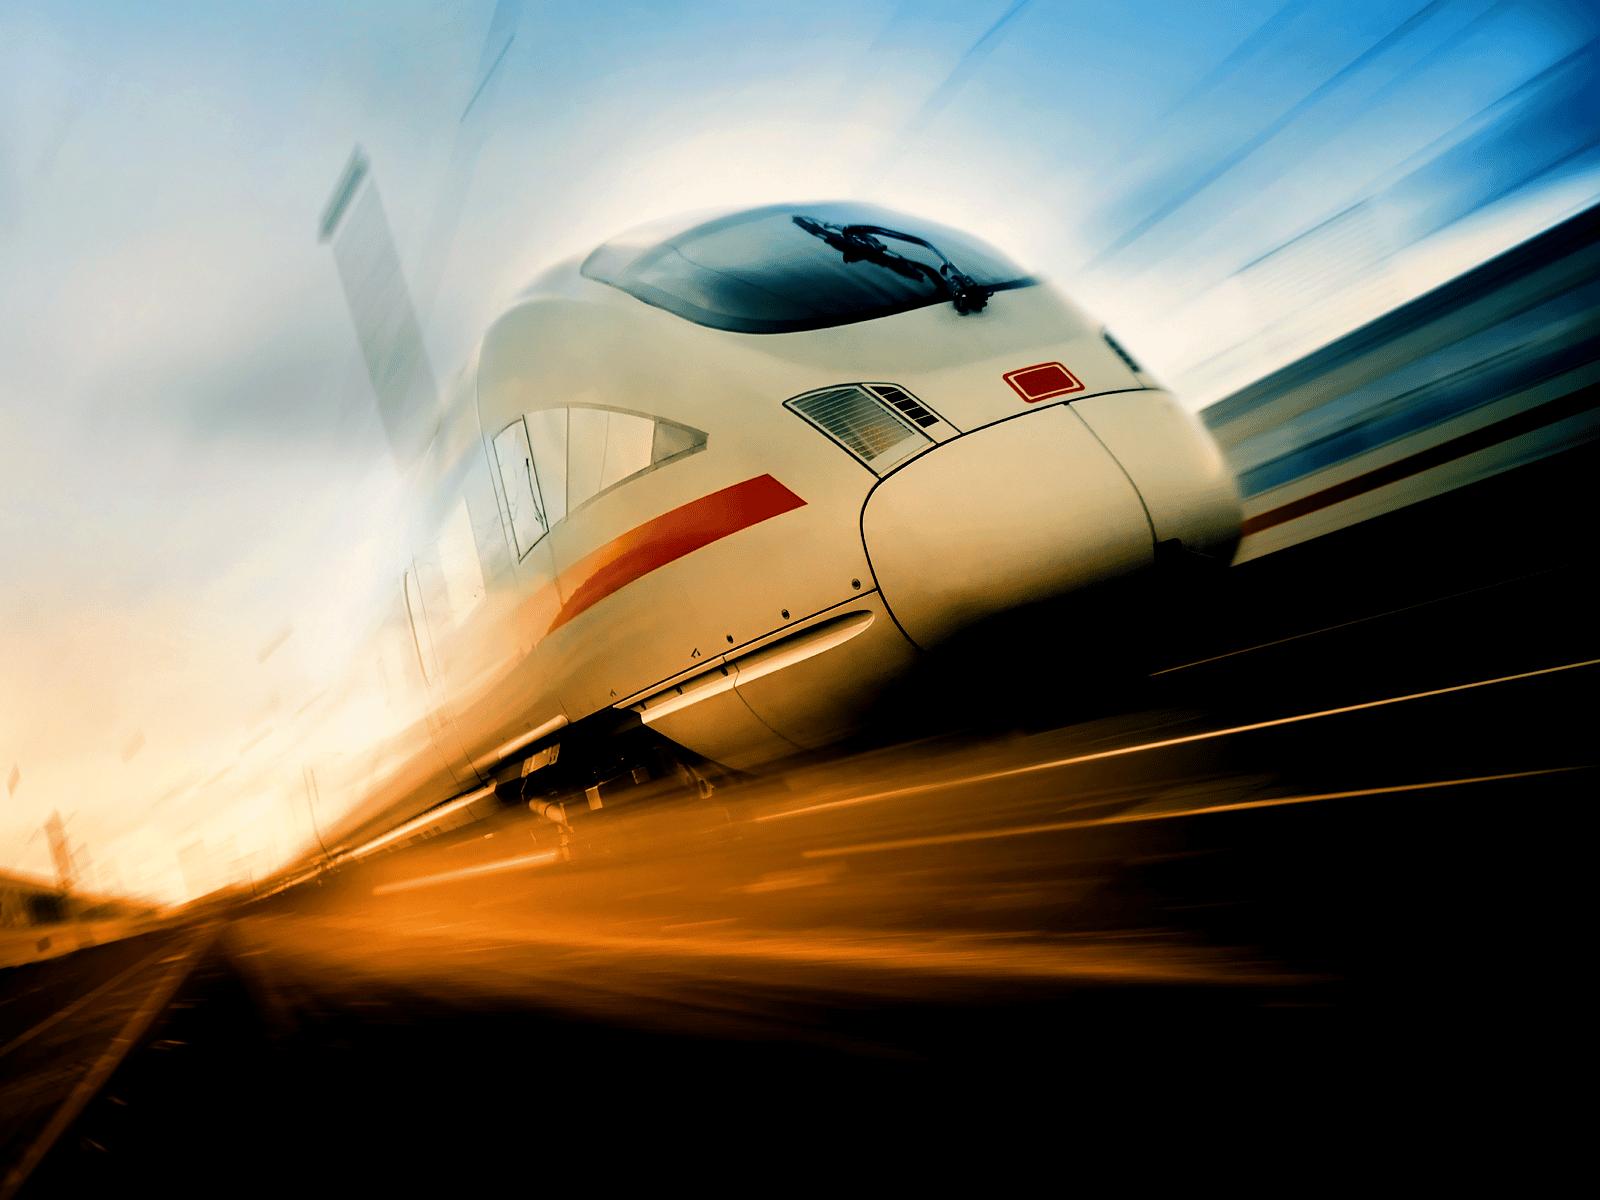 Le TGV bientôt en Thaïlande